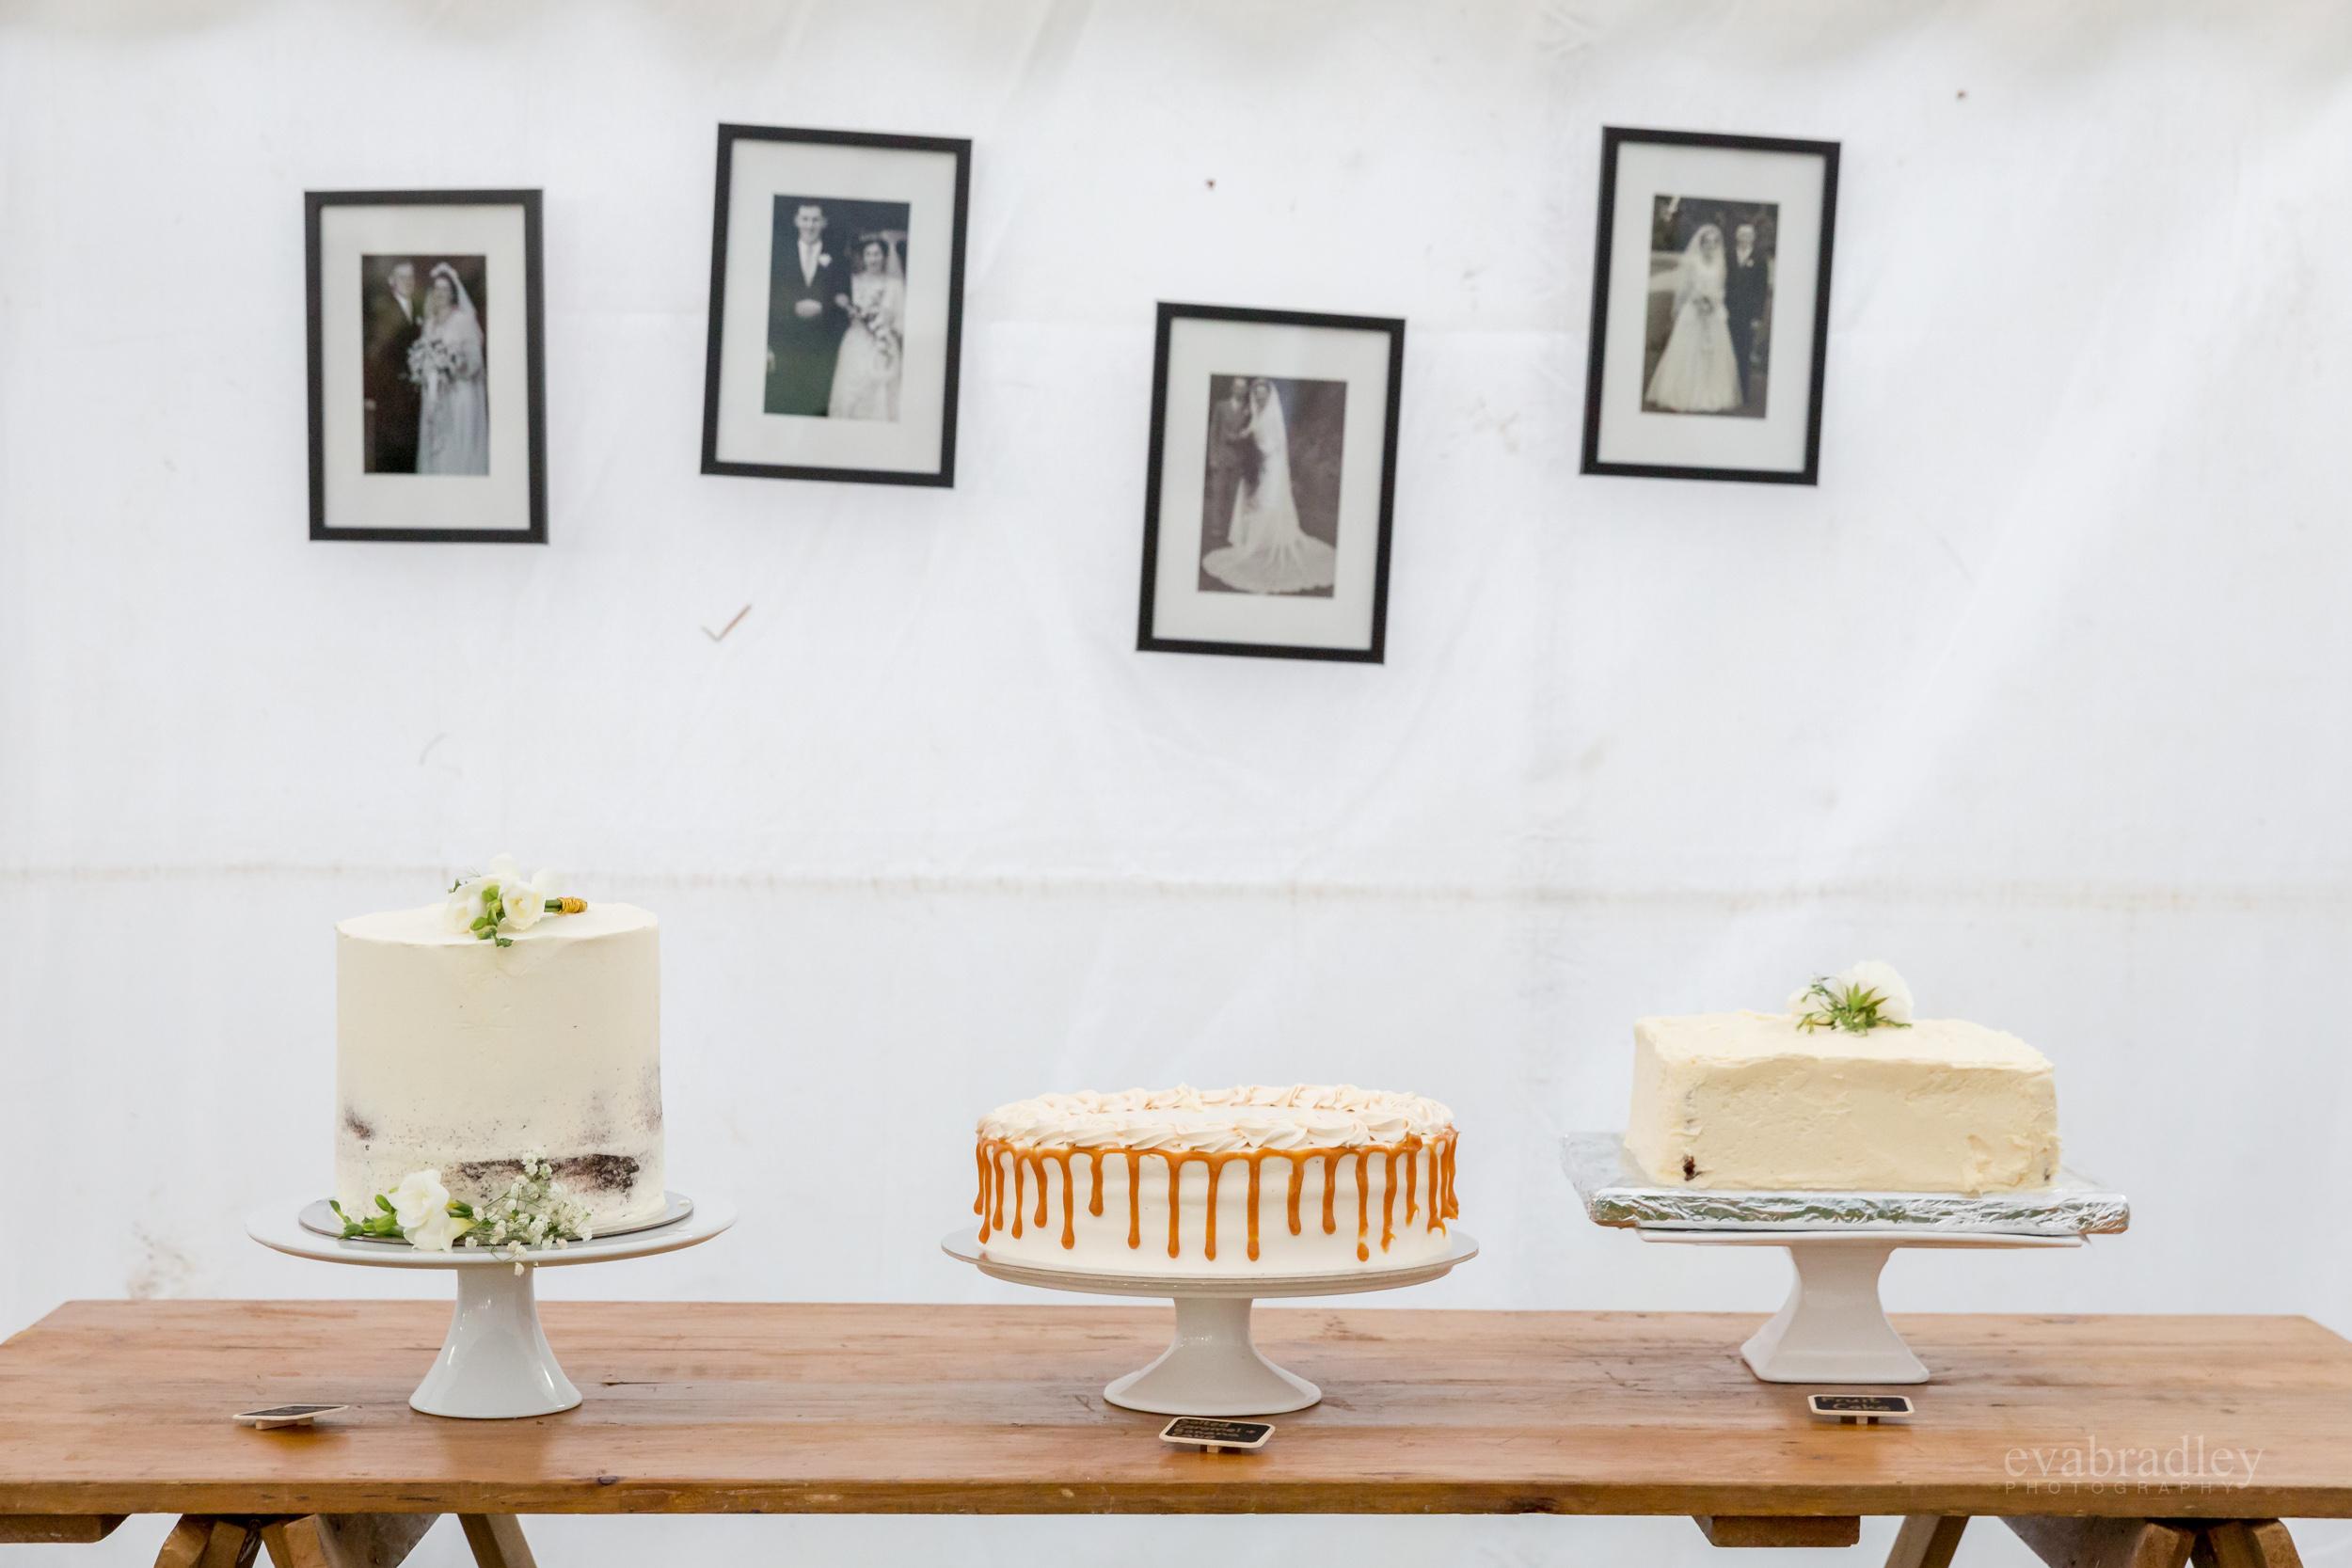 wedding-cakes-hawkes-bay